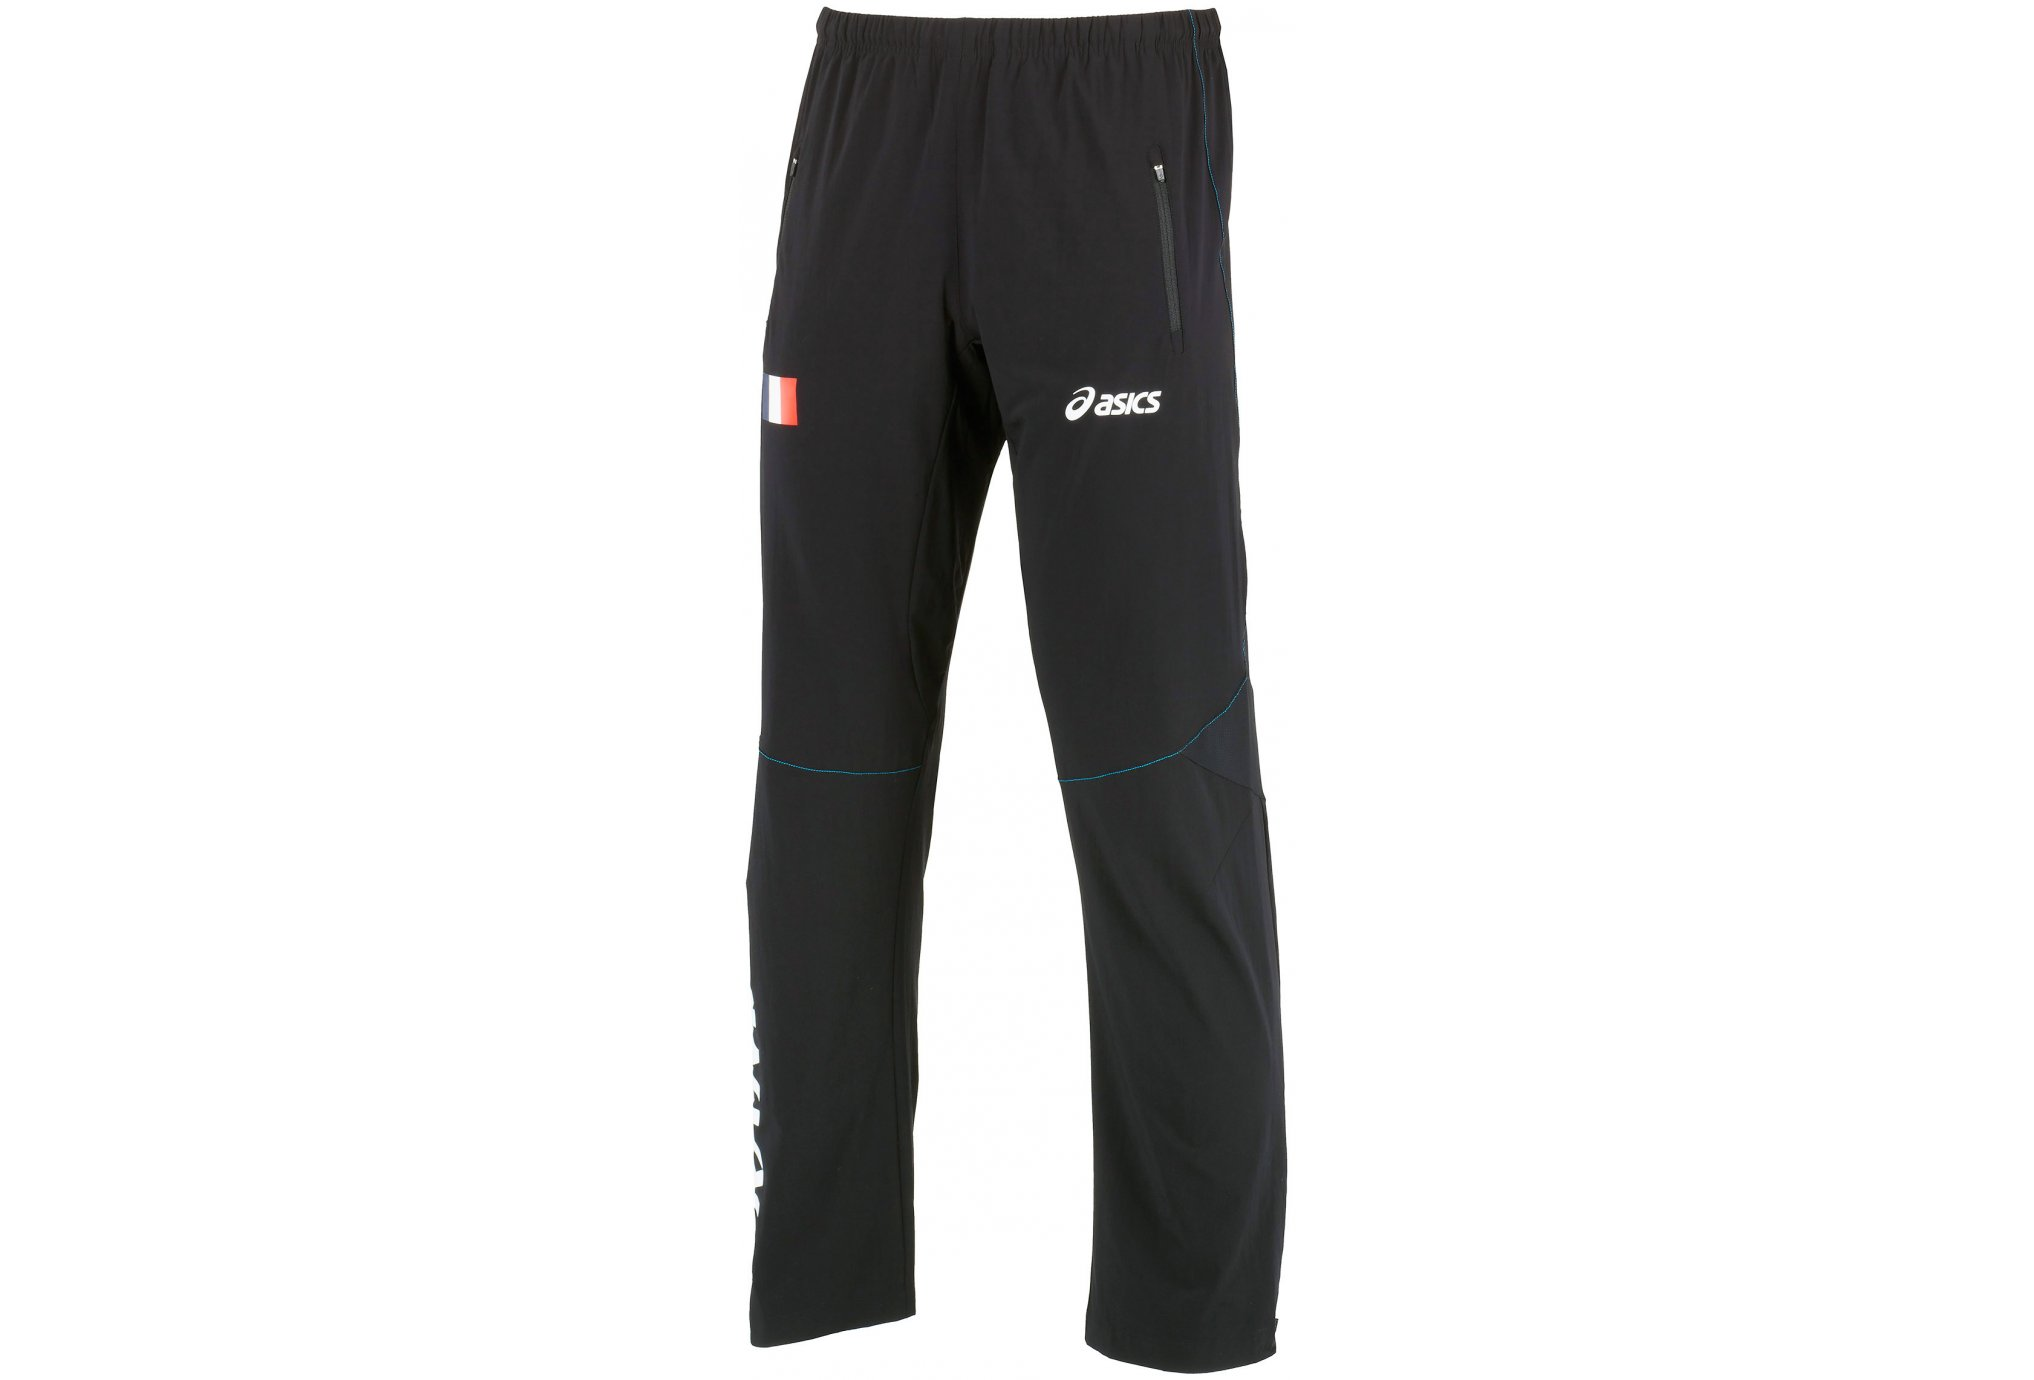 Asics Pantalon Équipe de France M vêtement running homme